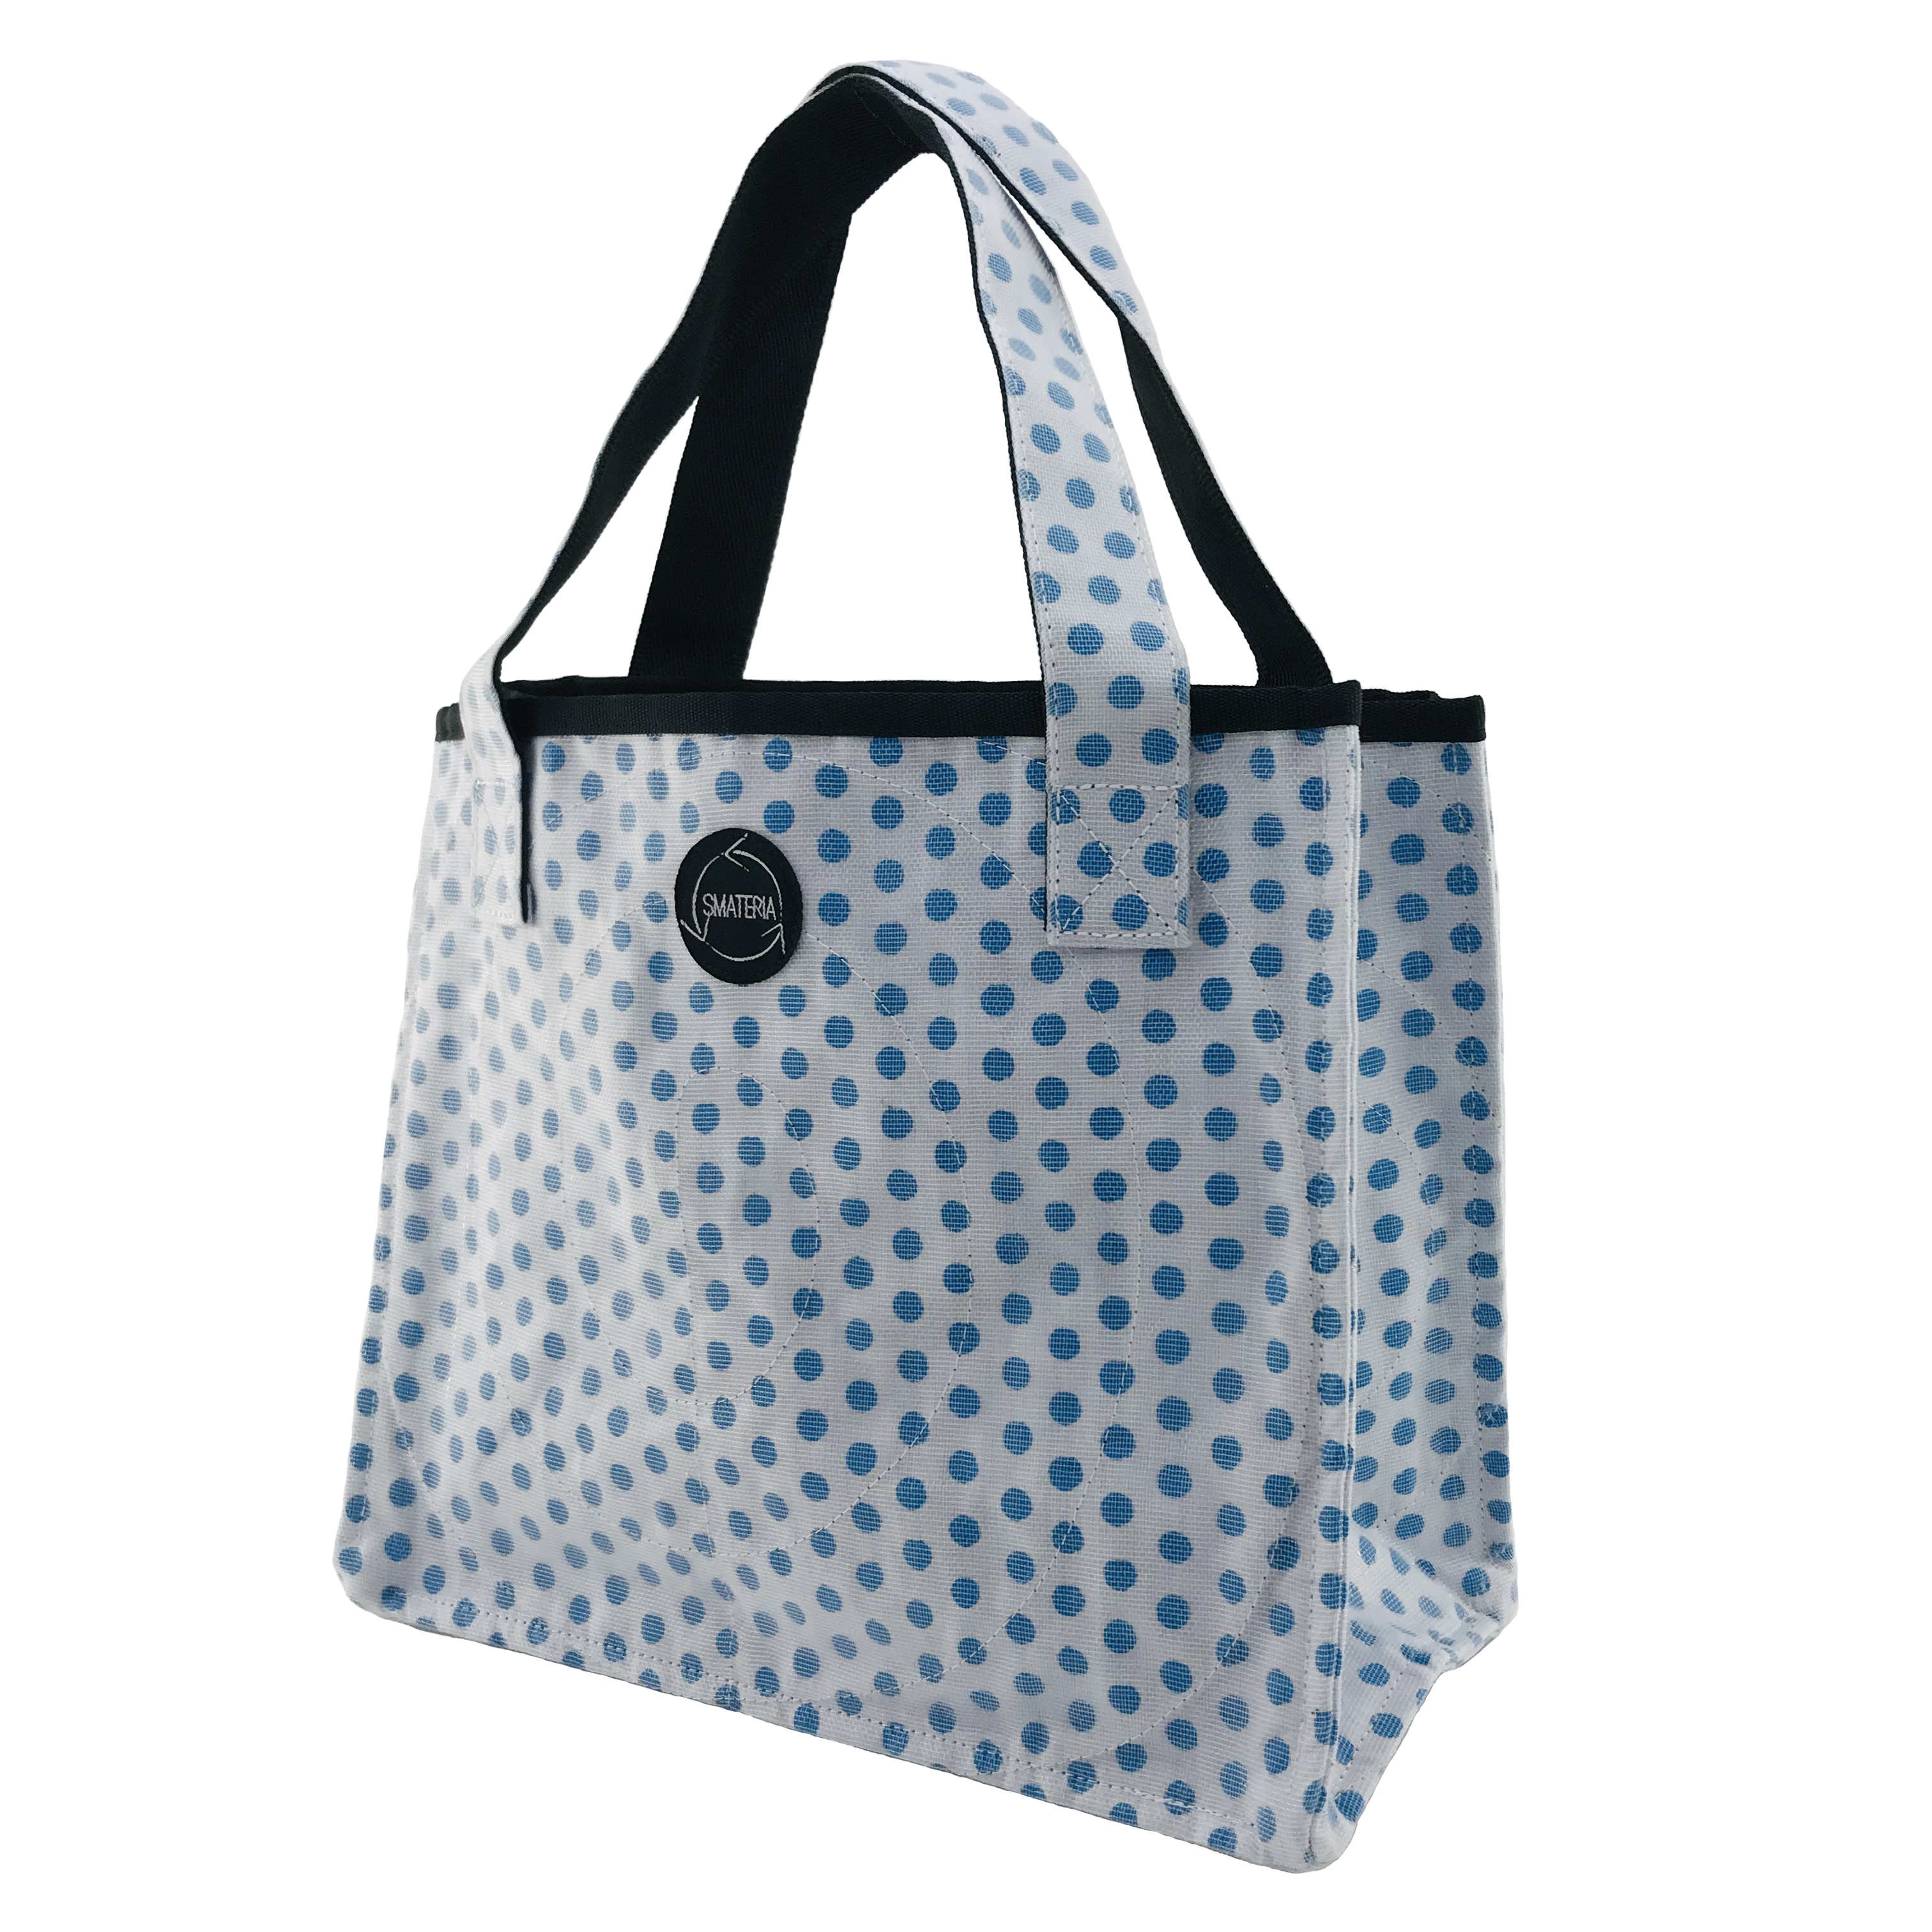 Shopper – All-purpose Ethical Bag - Blue Dots - Side